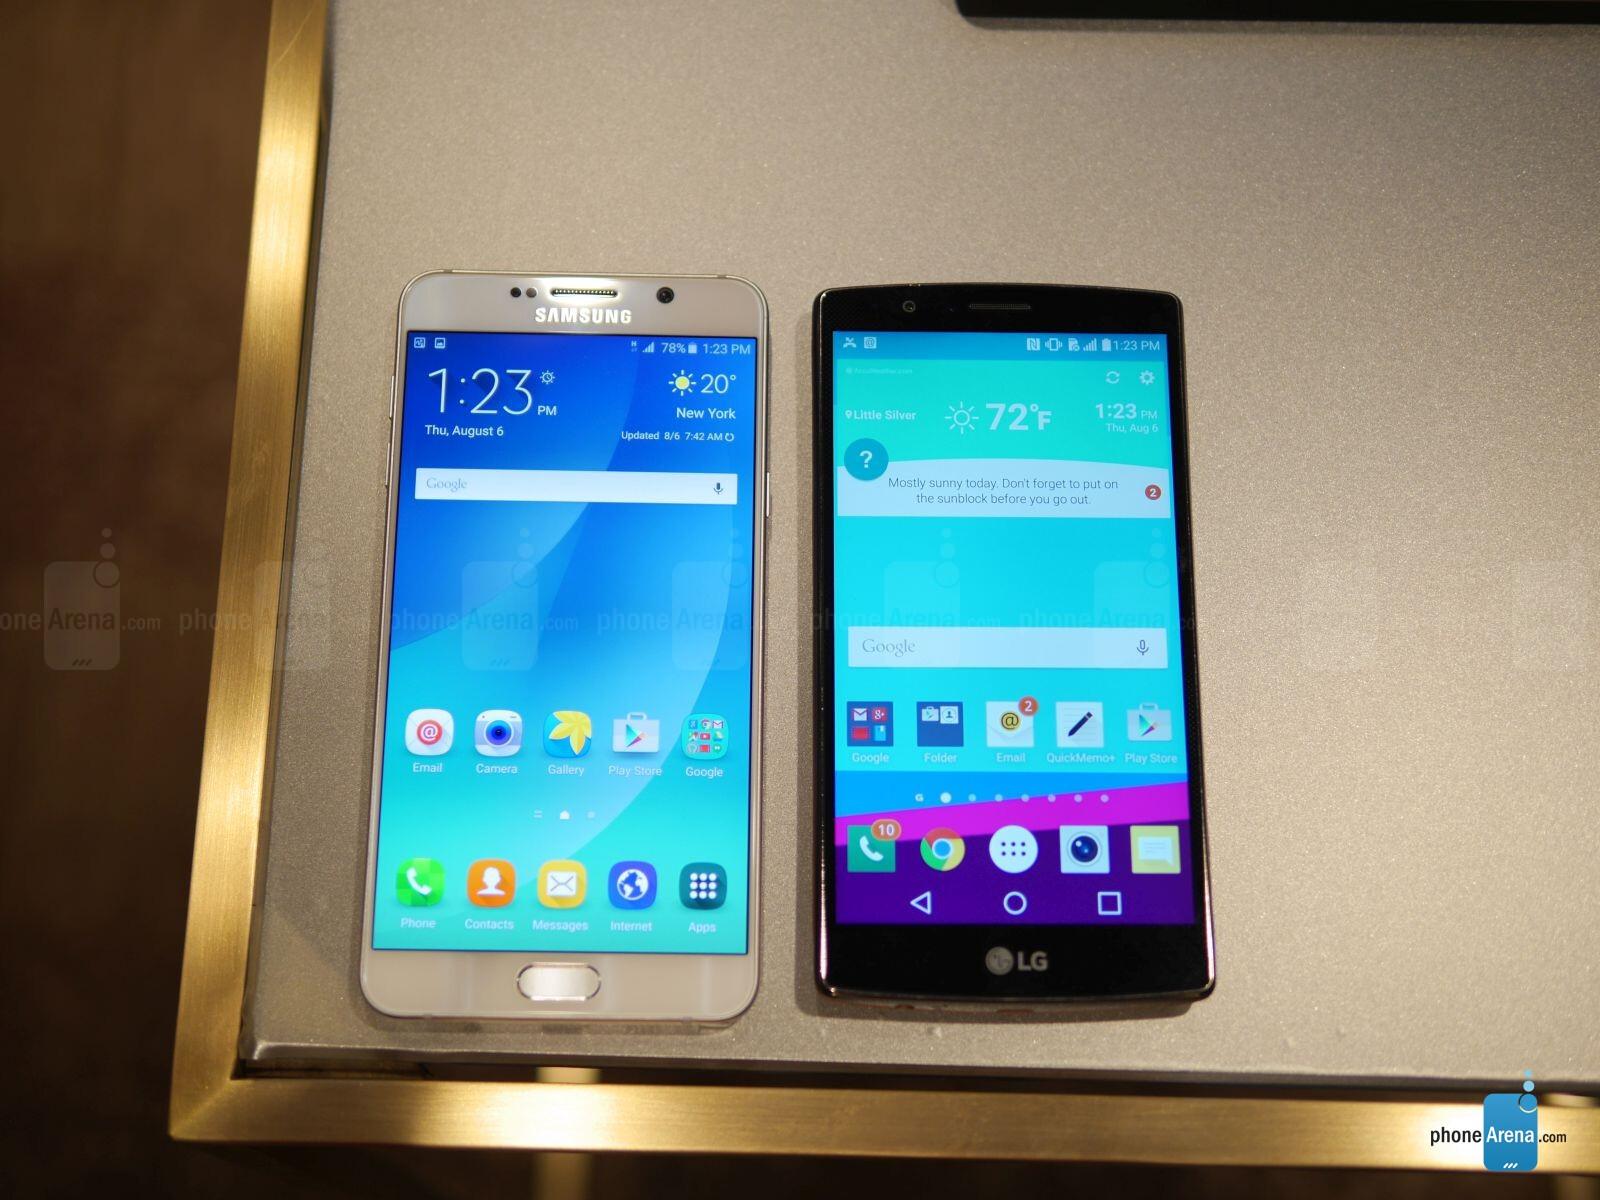 Samsung Galaxy Note5 Vs LG G4 First Look